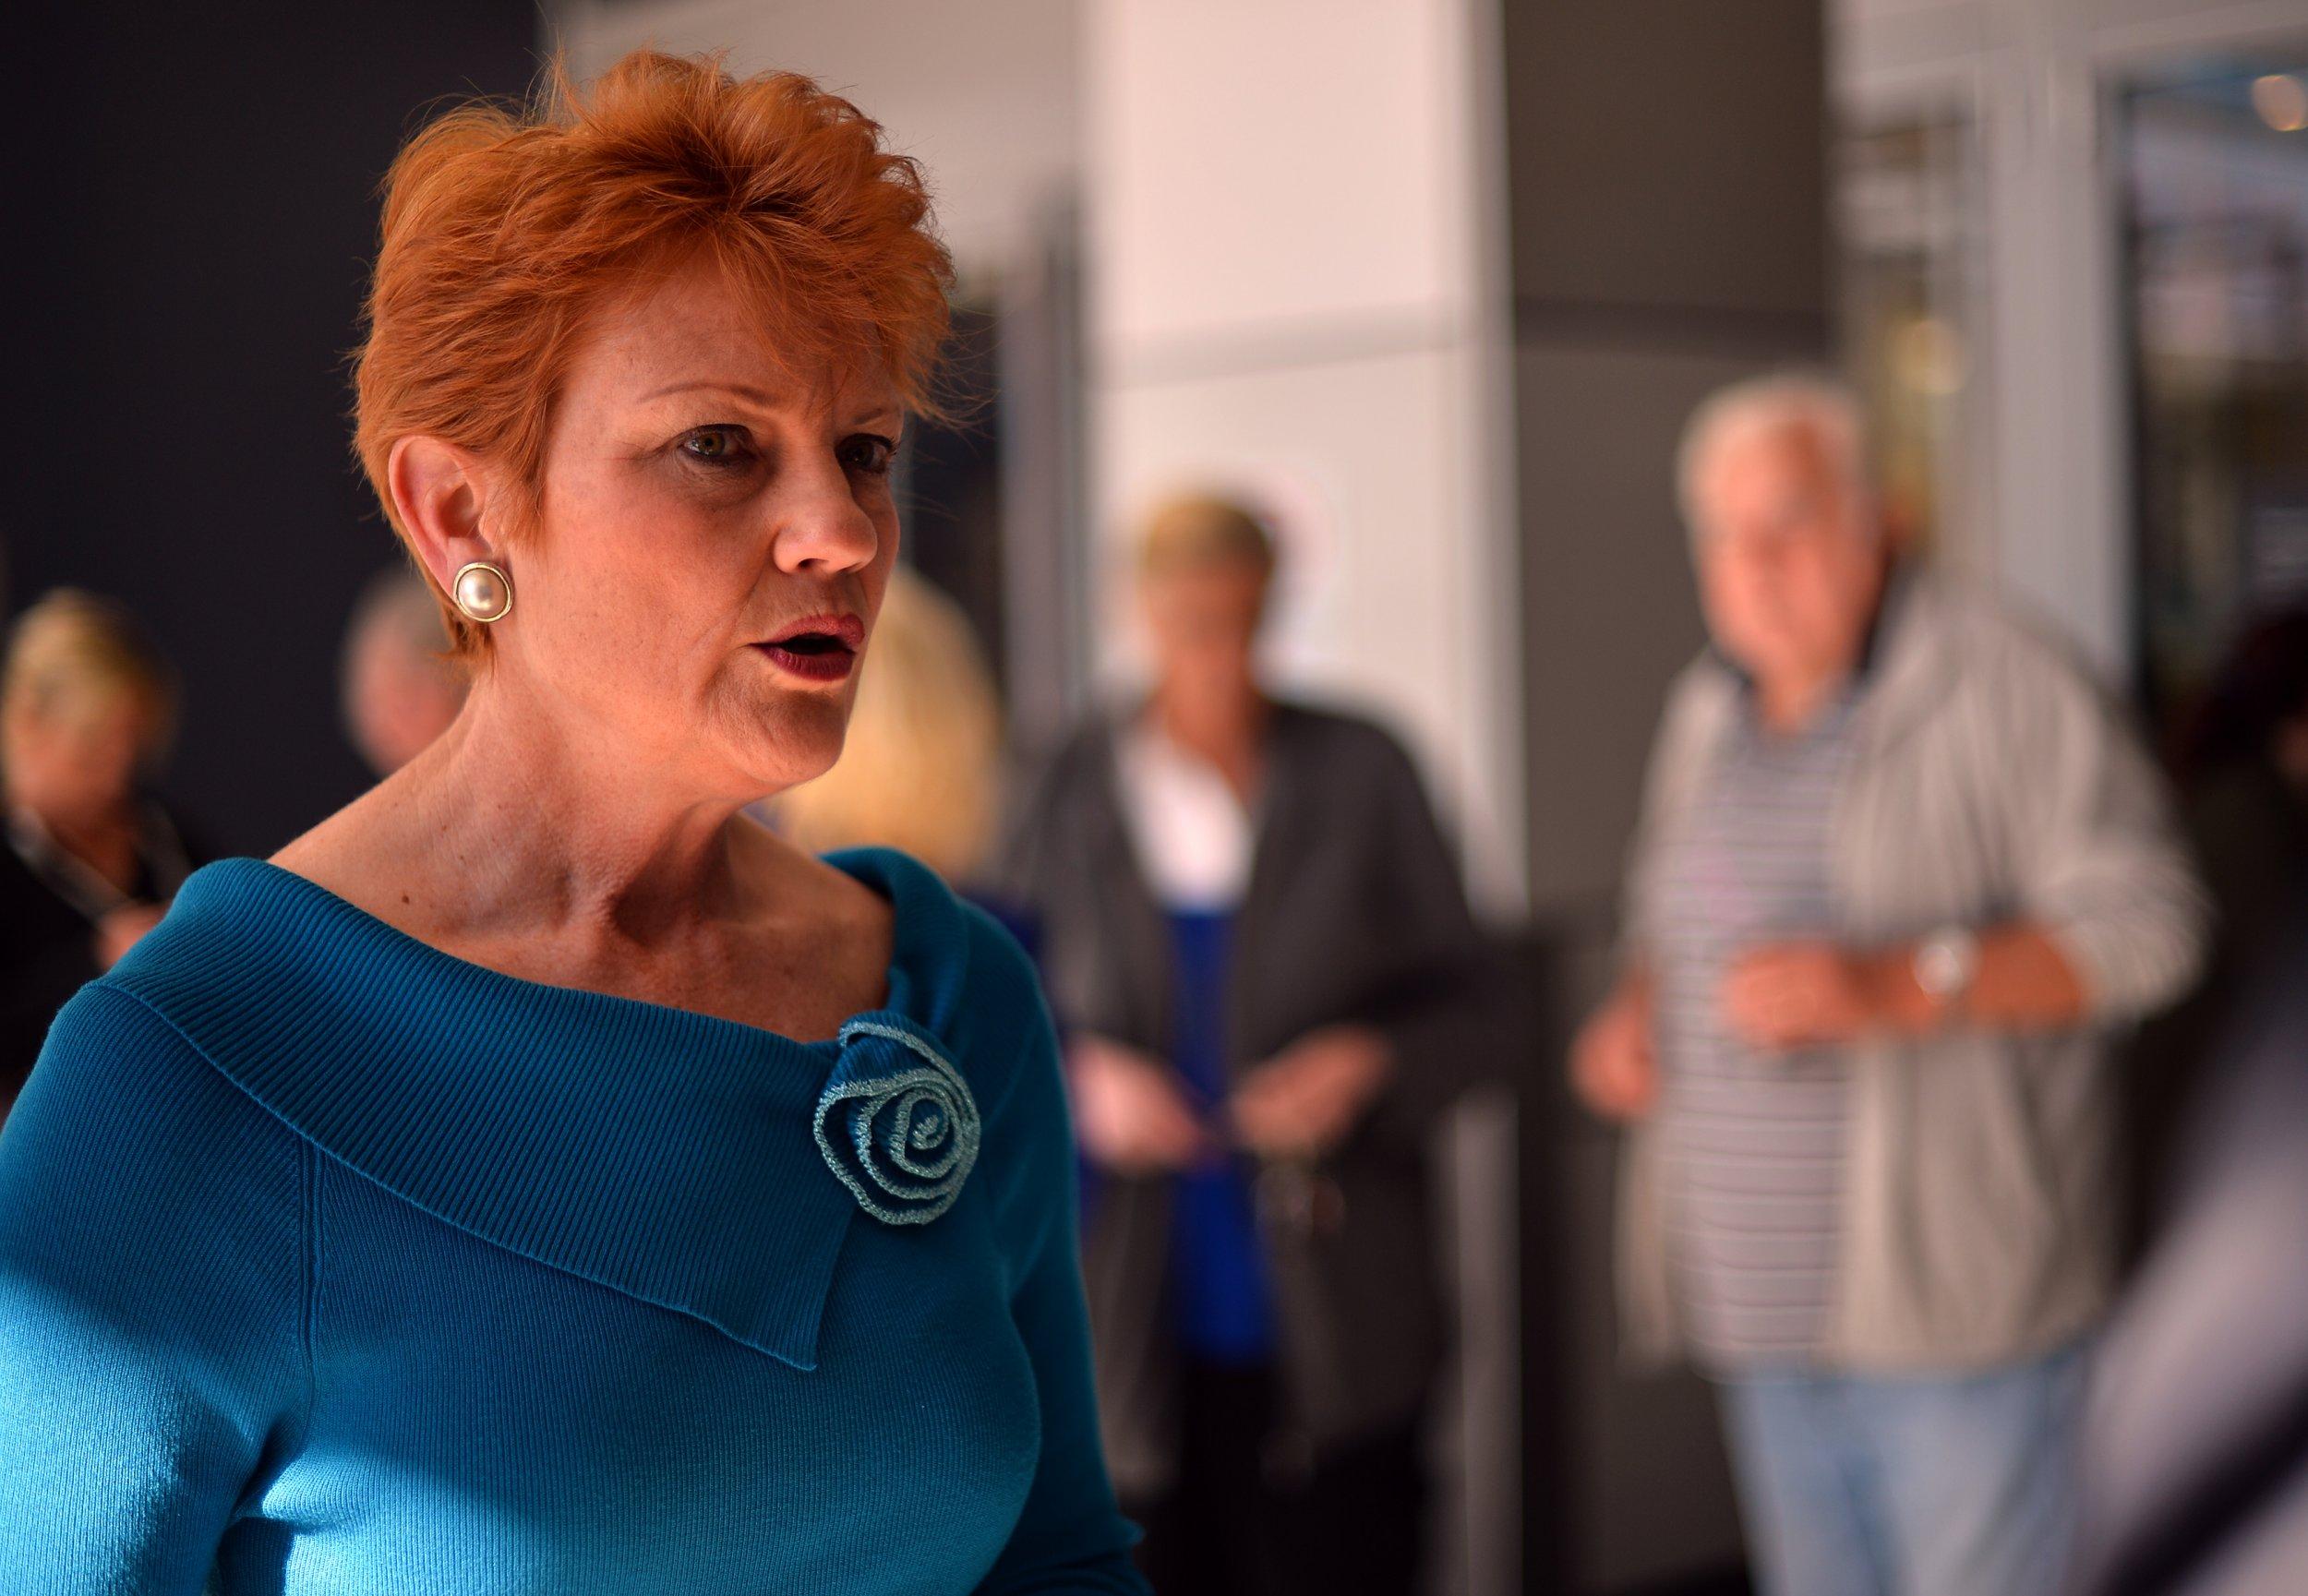 Australia's One Nation leader Pauline Hanson